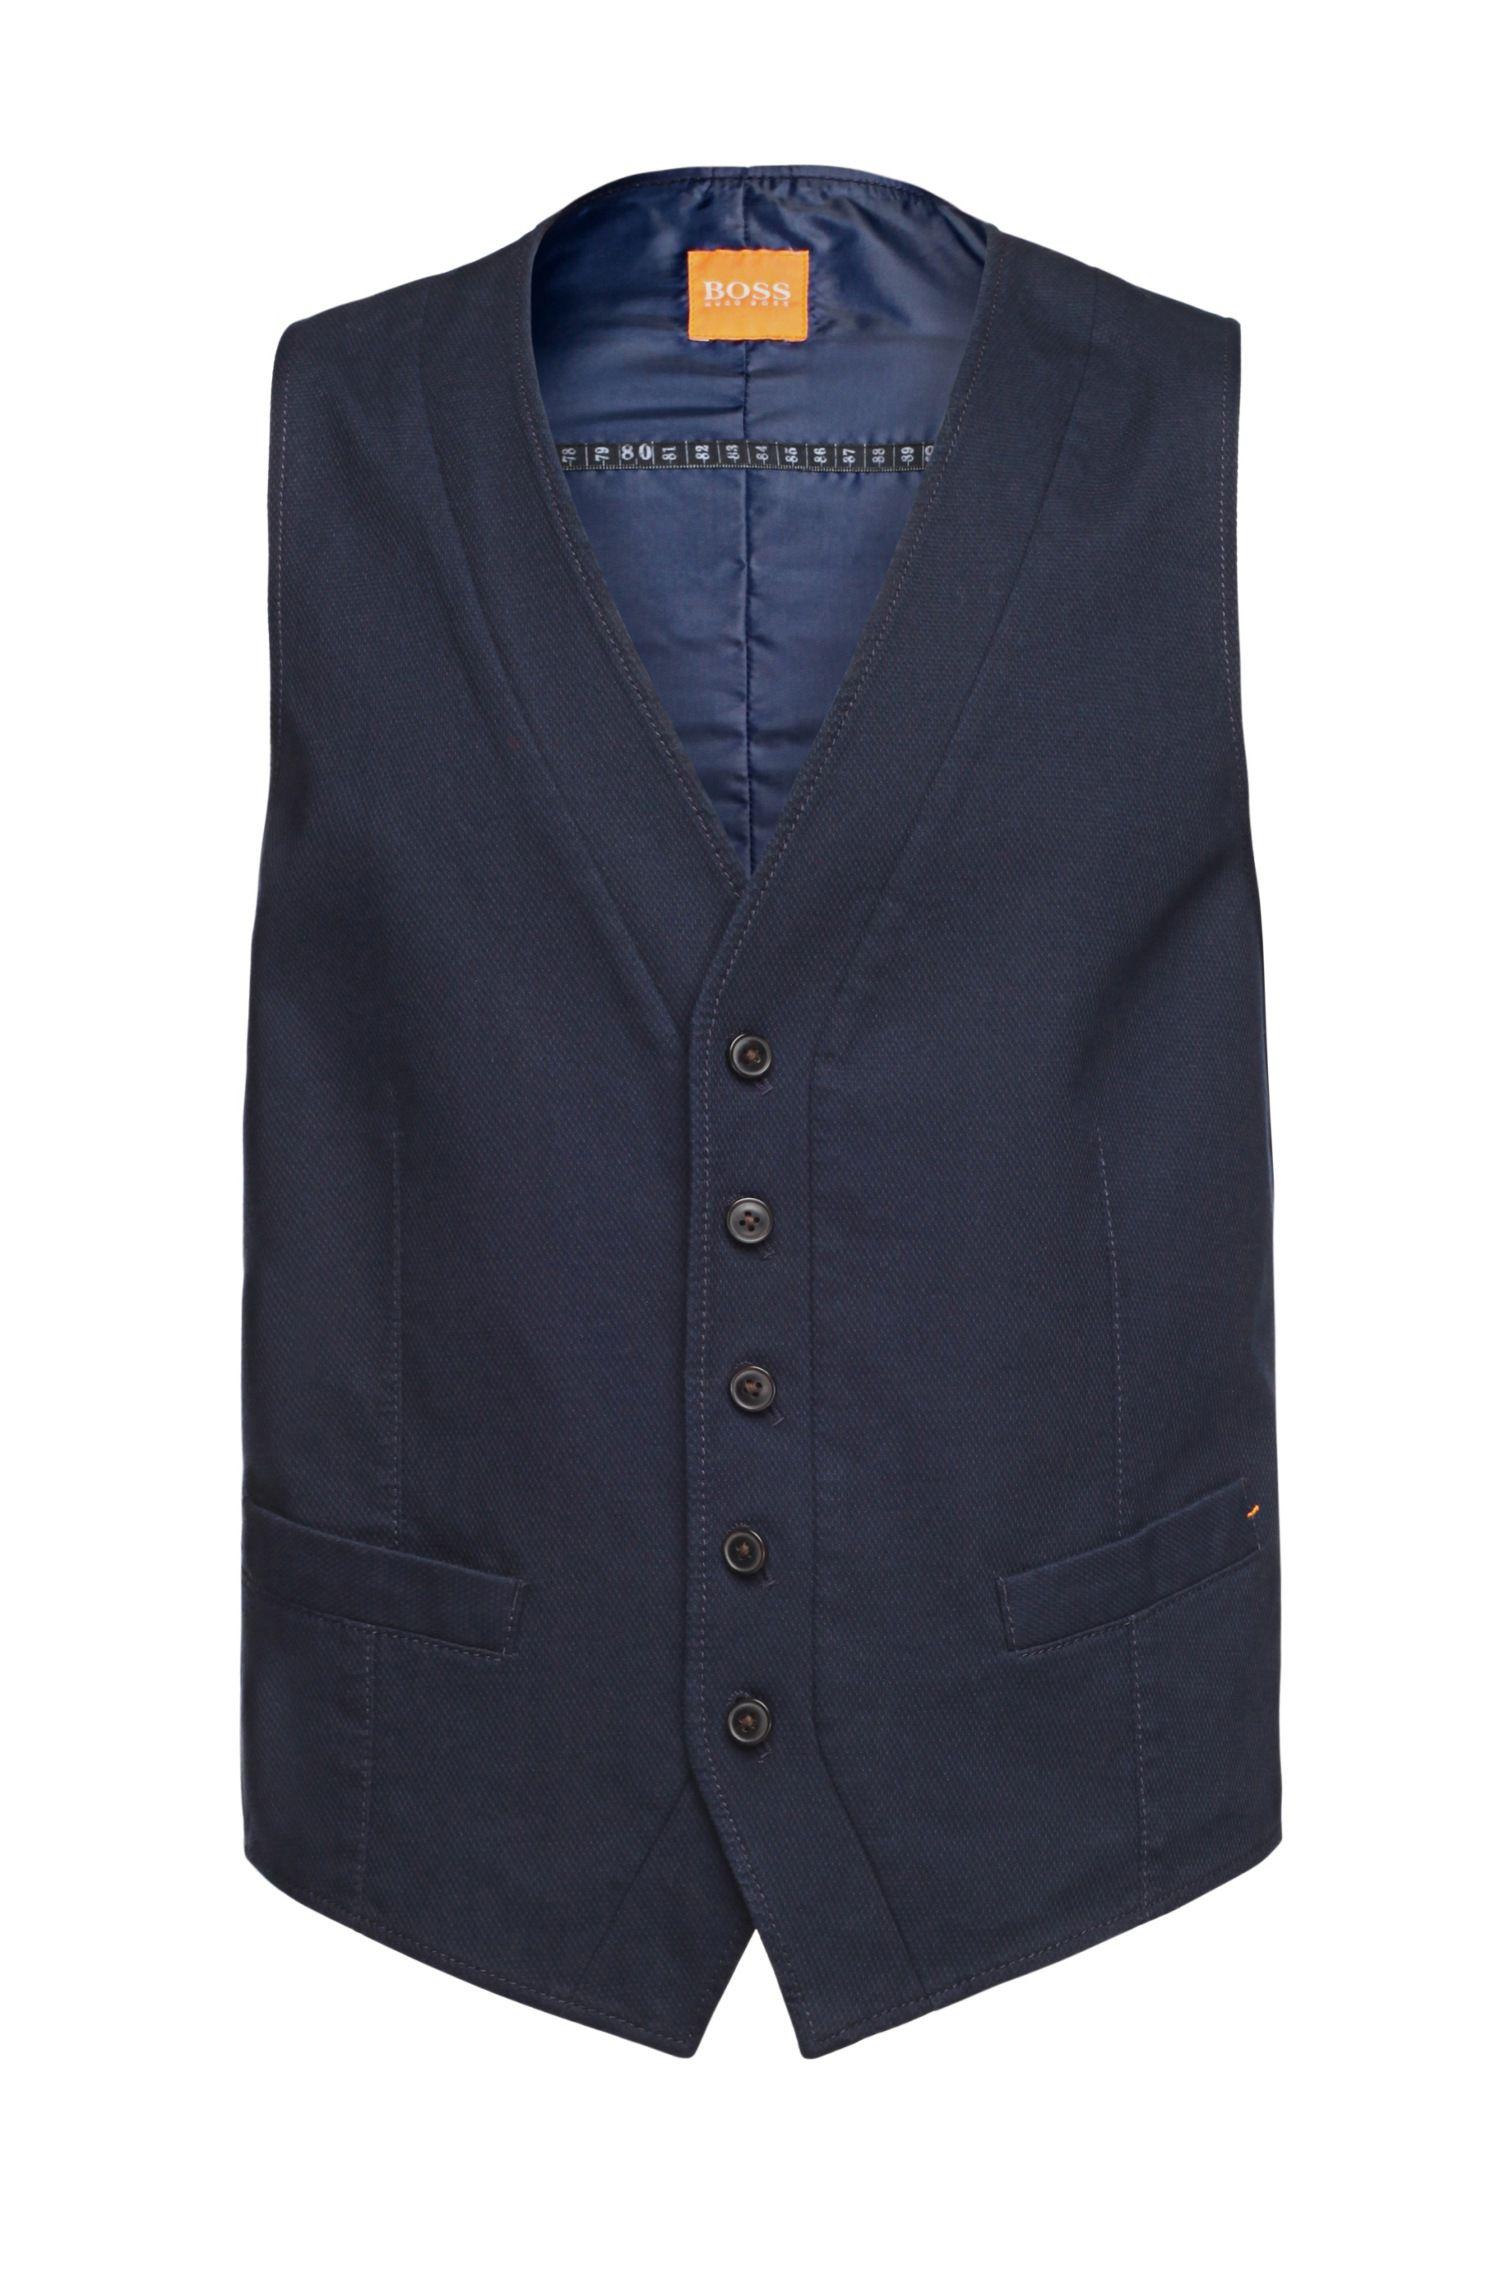 'Bosset_BS-W' | Slim Fit, Stretch Cotton Vest